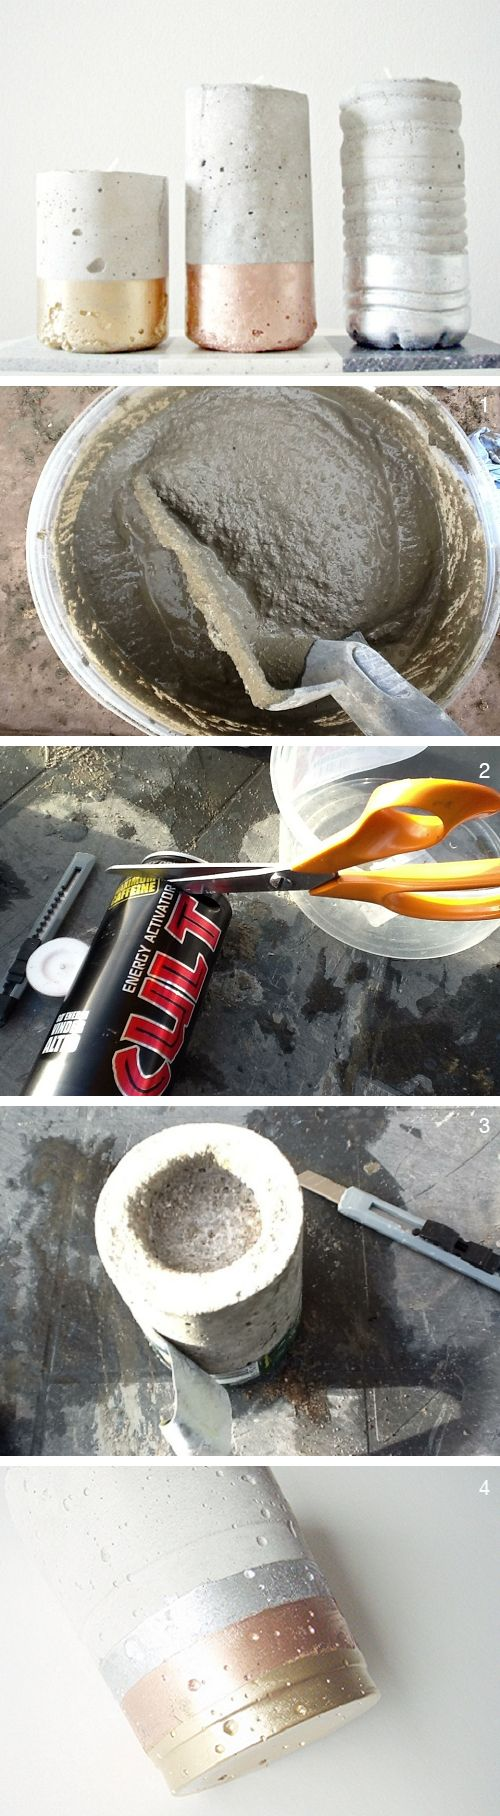 DIY Anleitung: Kerzenständer aus Beton gießen // diy tutorial: how to make concrete candle holders via DaWanda.com